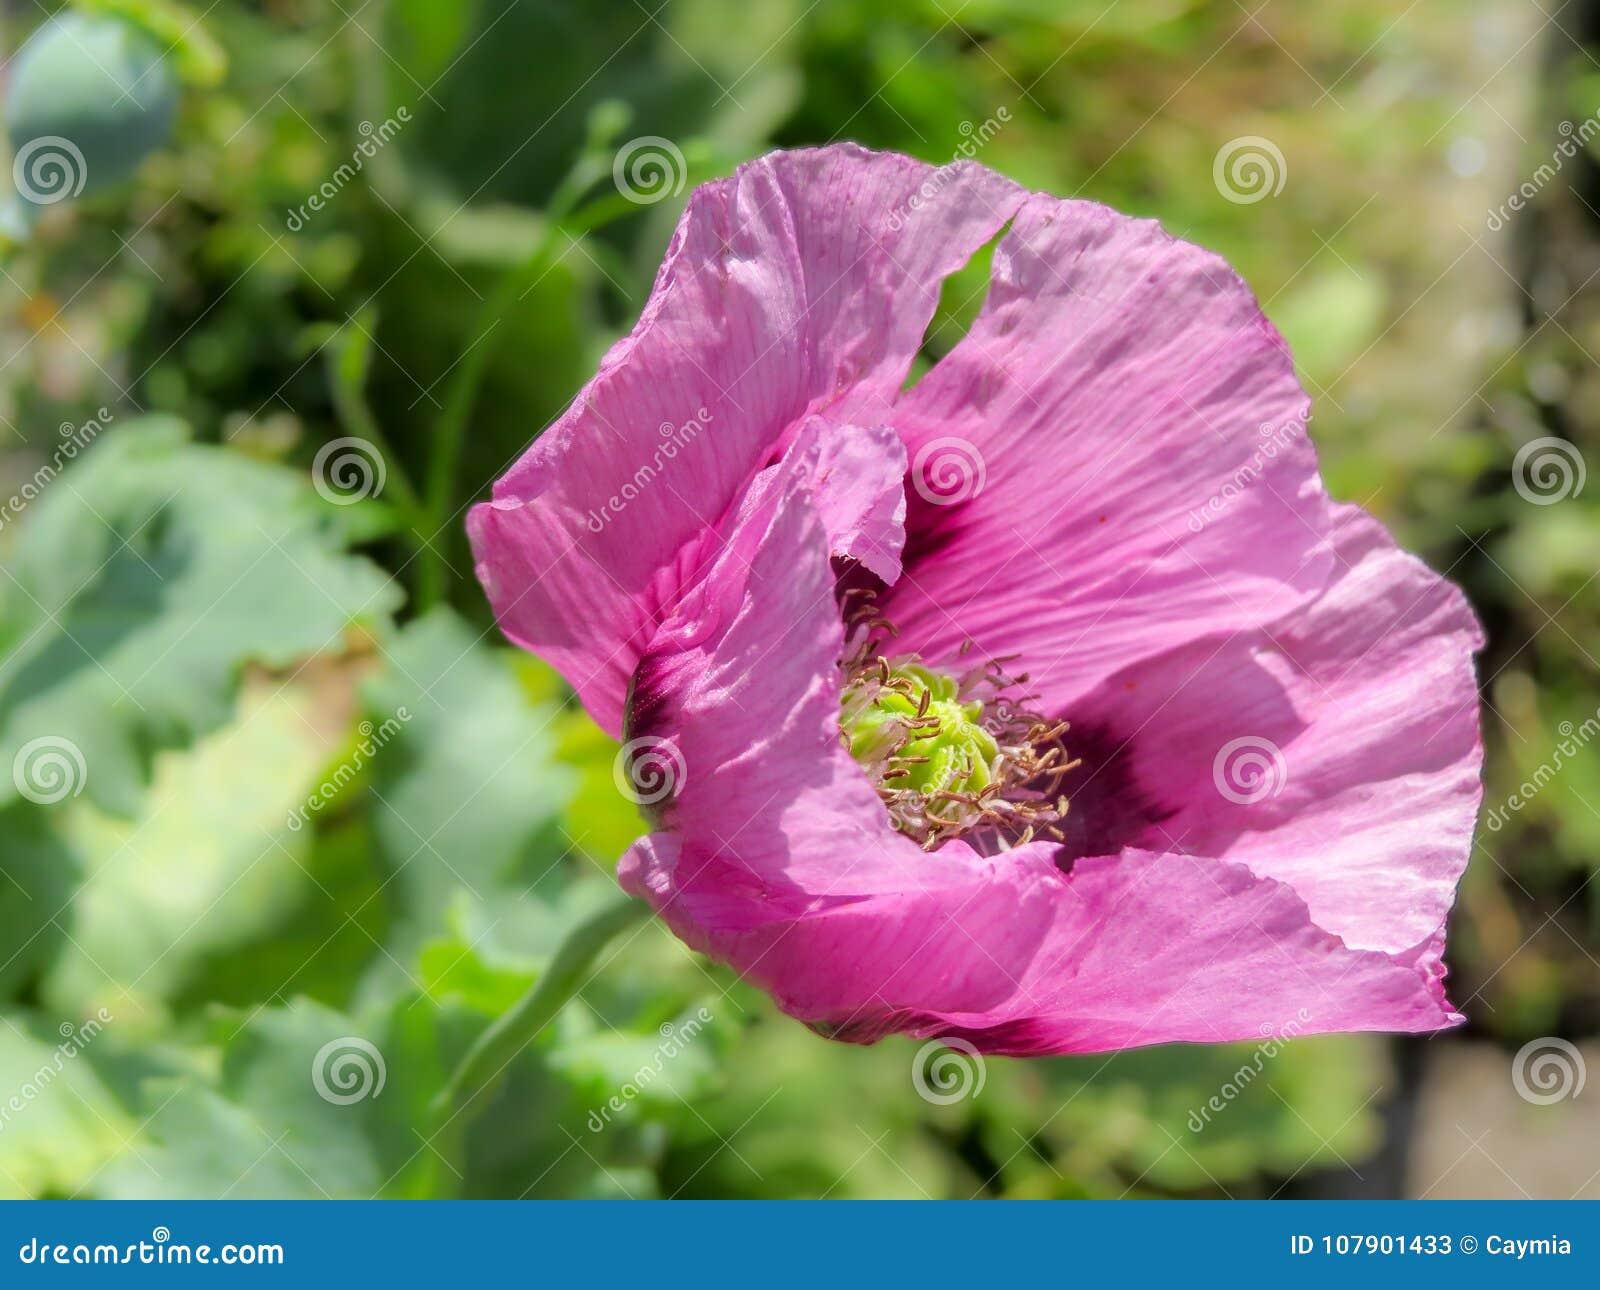 Closeup Of A Pink Opium Poppy Flower Papaver Somniferum Stock